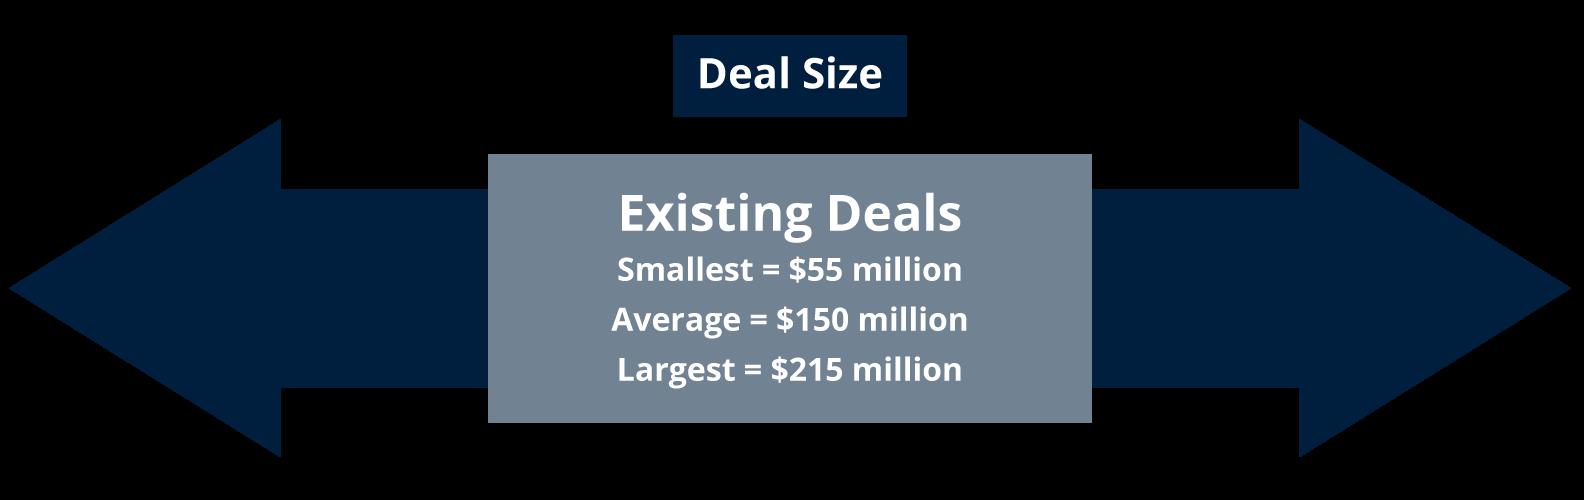 SFJ-deal-size image